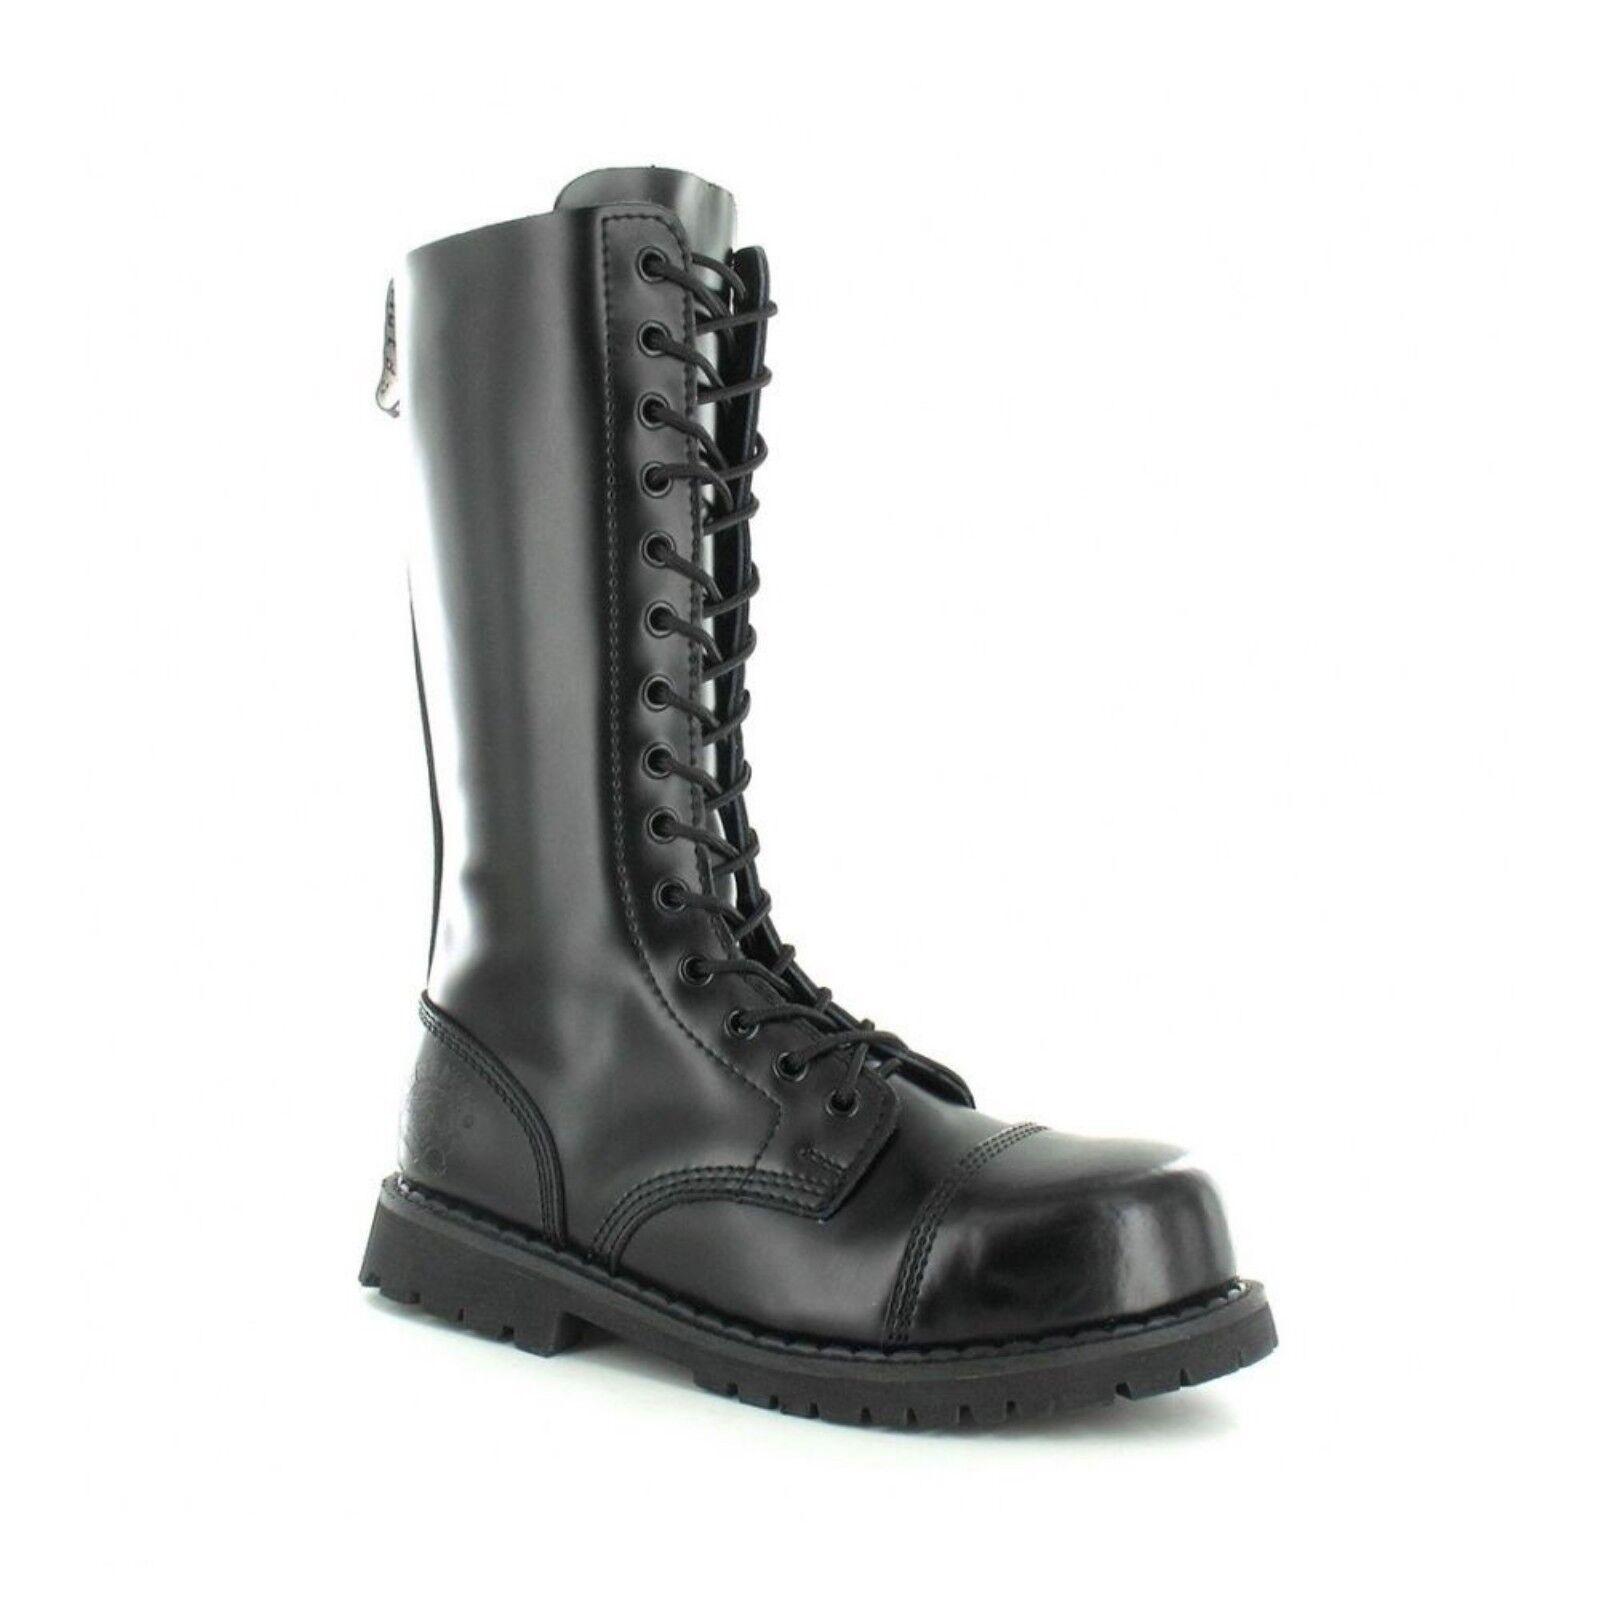 Grinders neri Alta Ranger Combat Stivali neri Grinders in pelle in acciaio di sicurezza Cap 14 occhielli Punk 8961b3